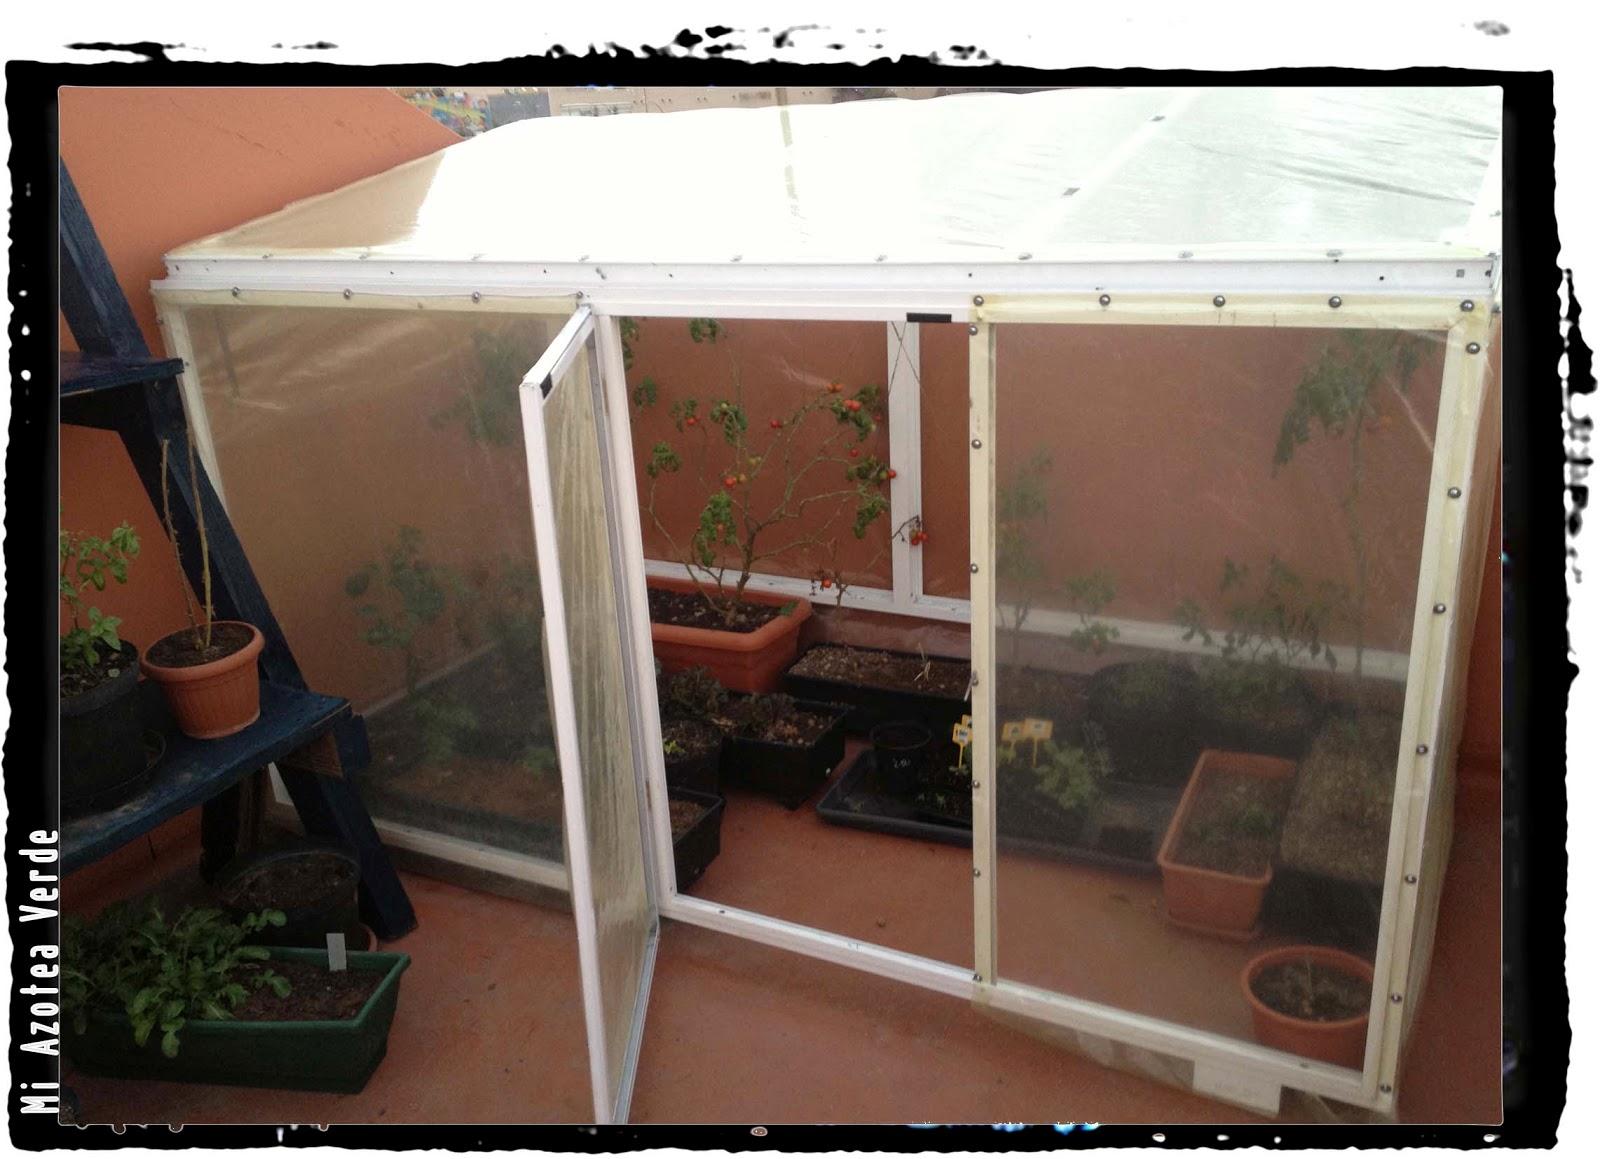 Mini invernadero macetero con materiales reciclados mi - Mini invernadero casero ...